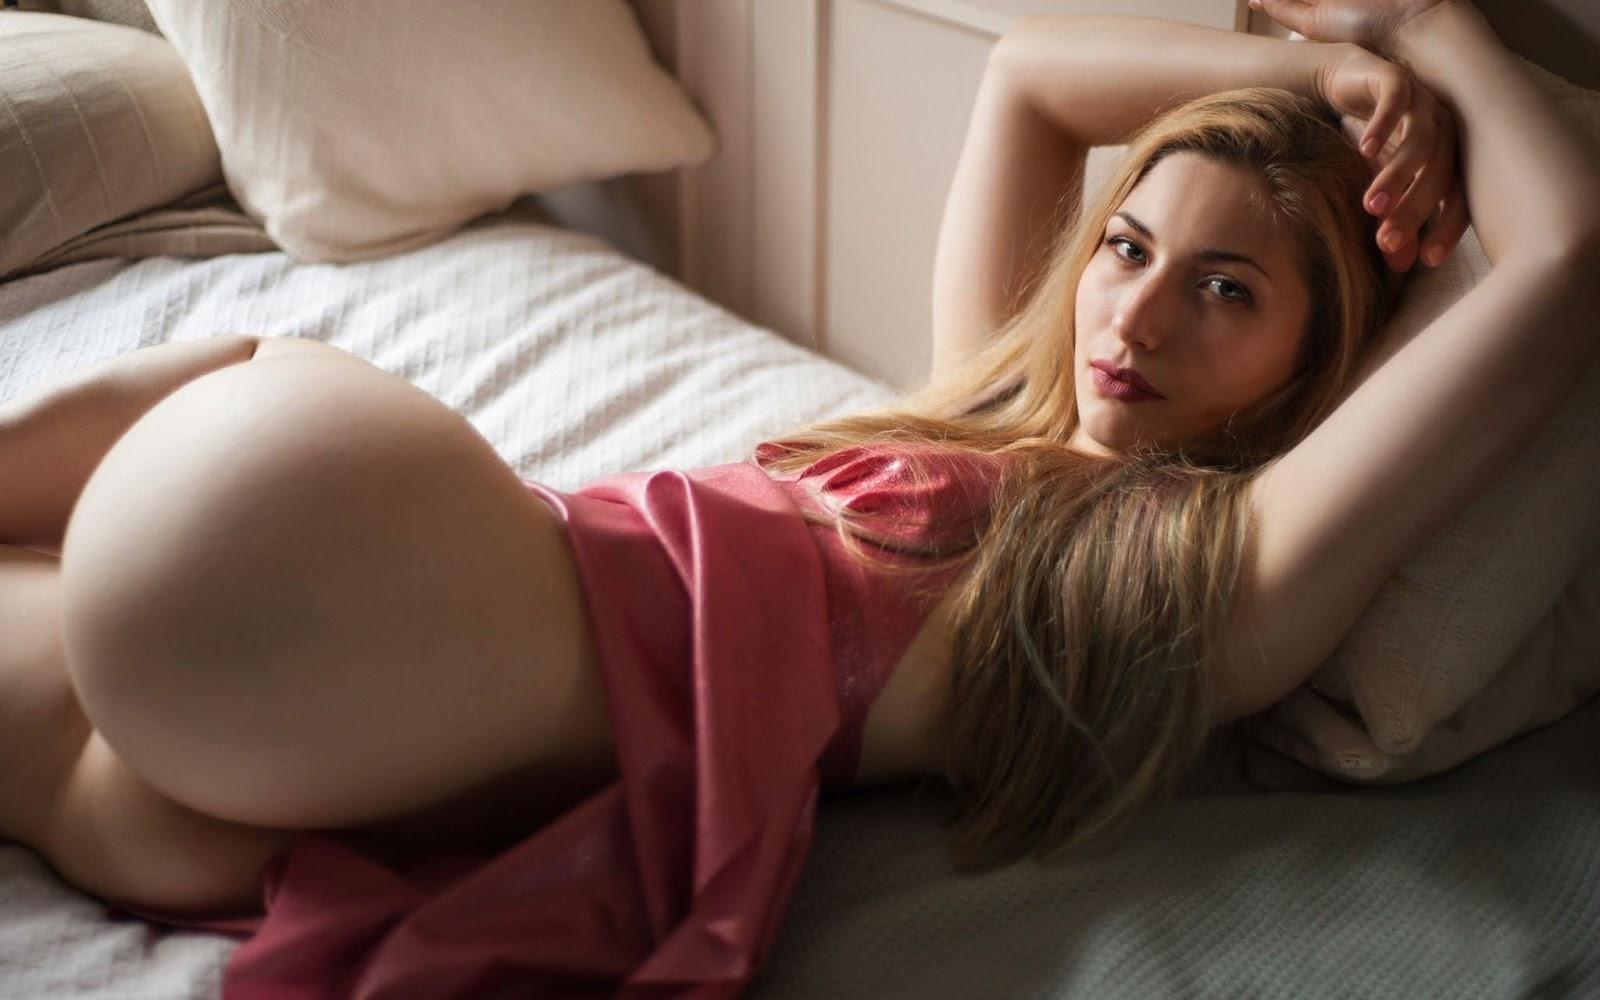 Секса японкой попа эро красавицы видео